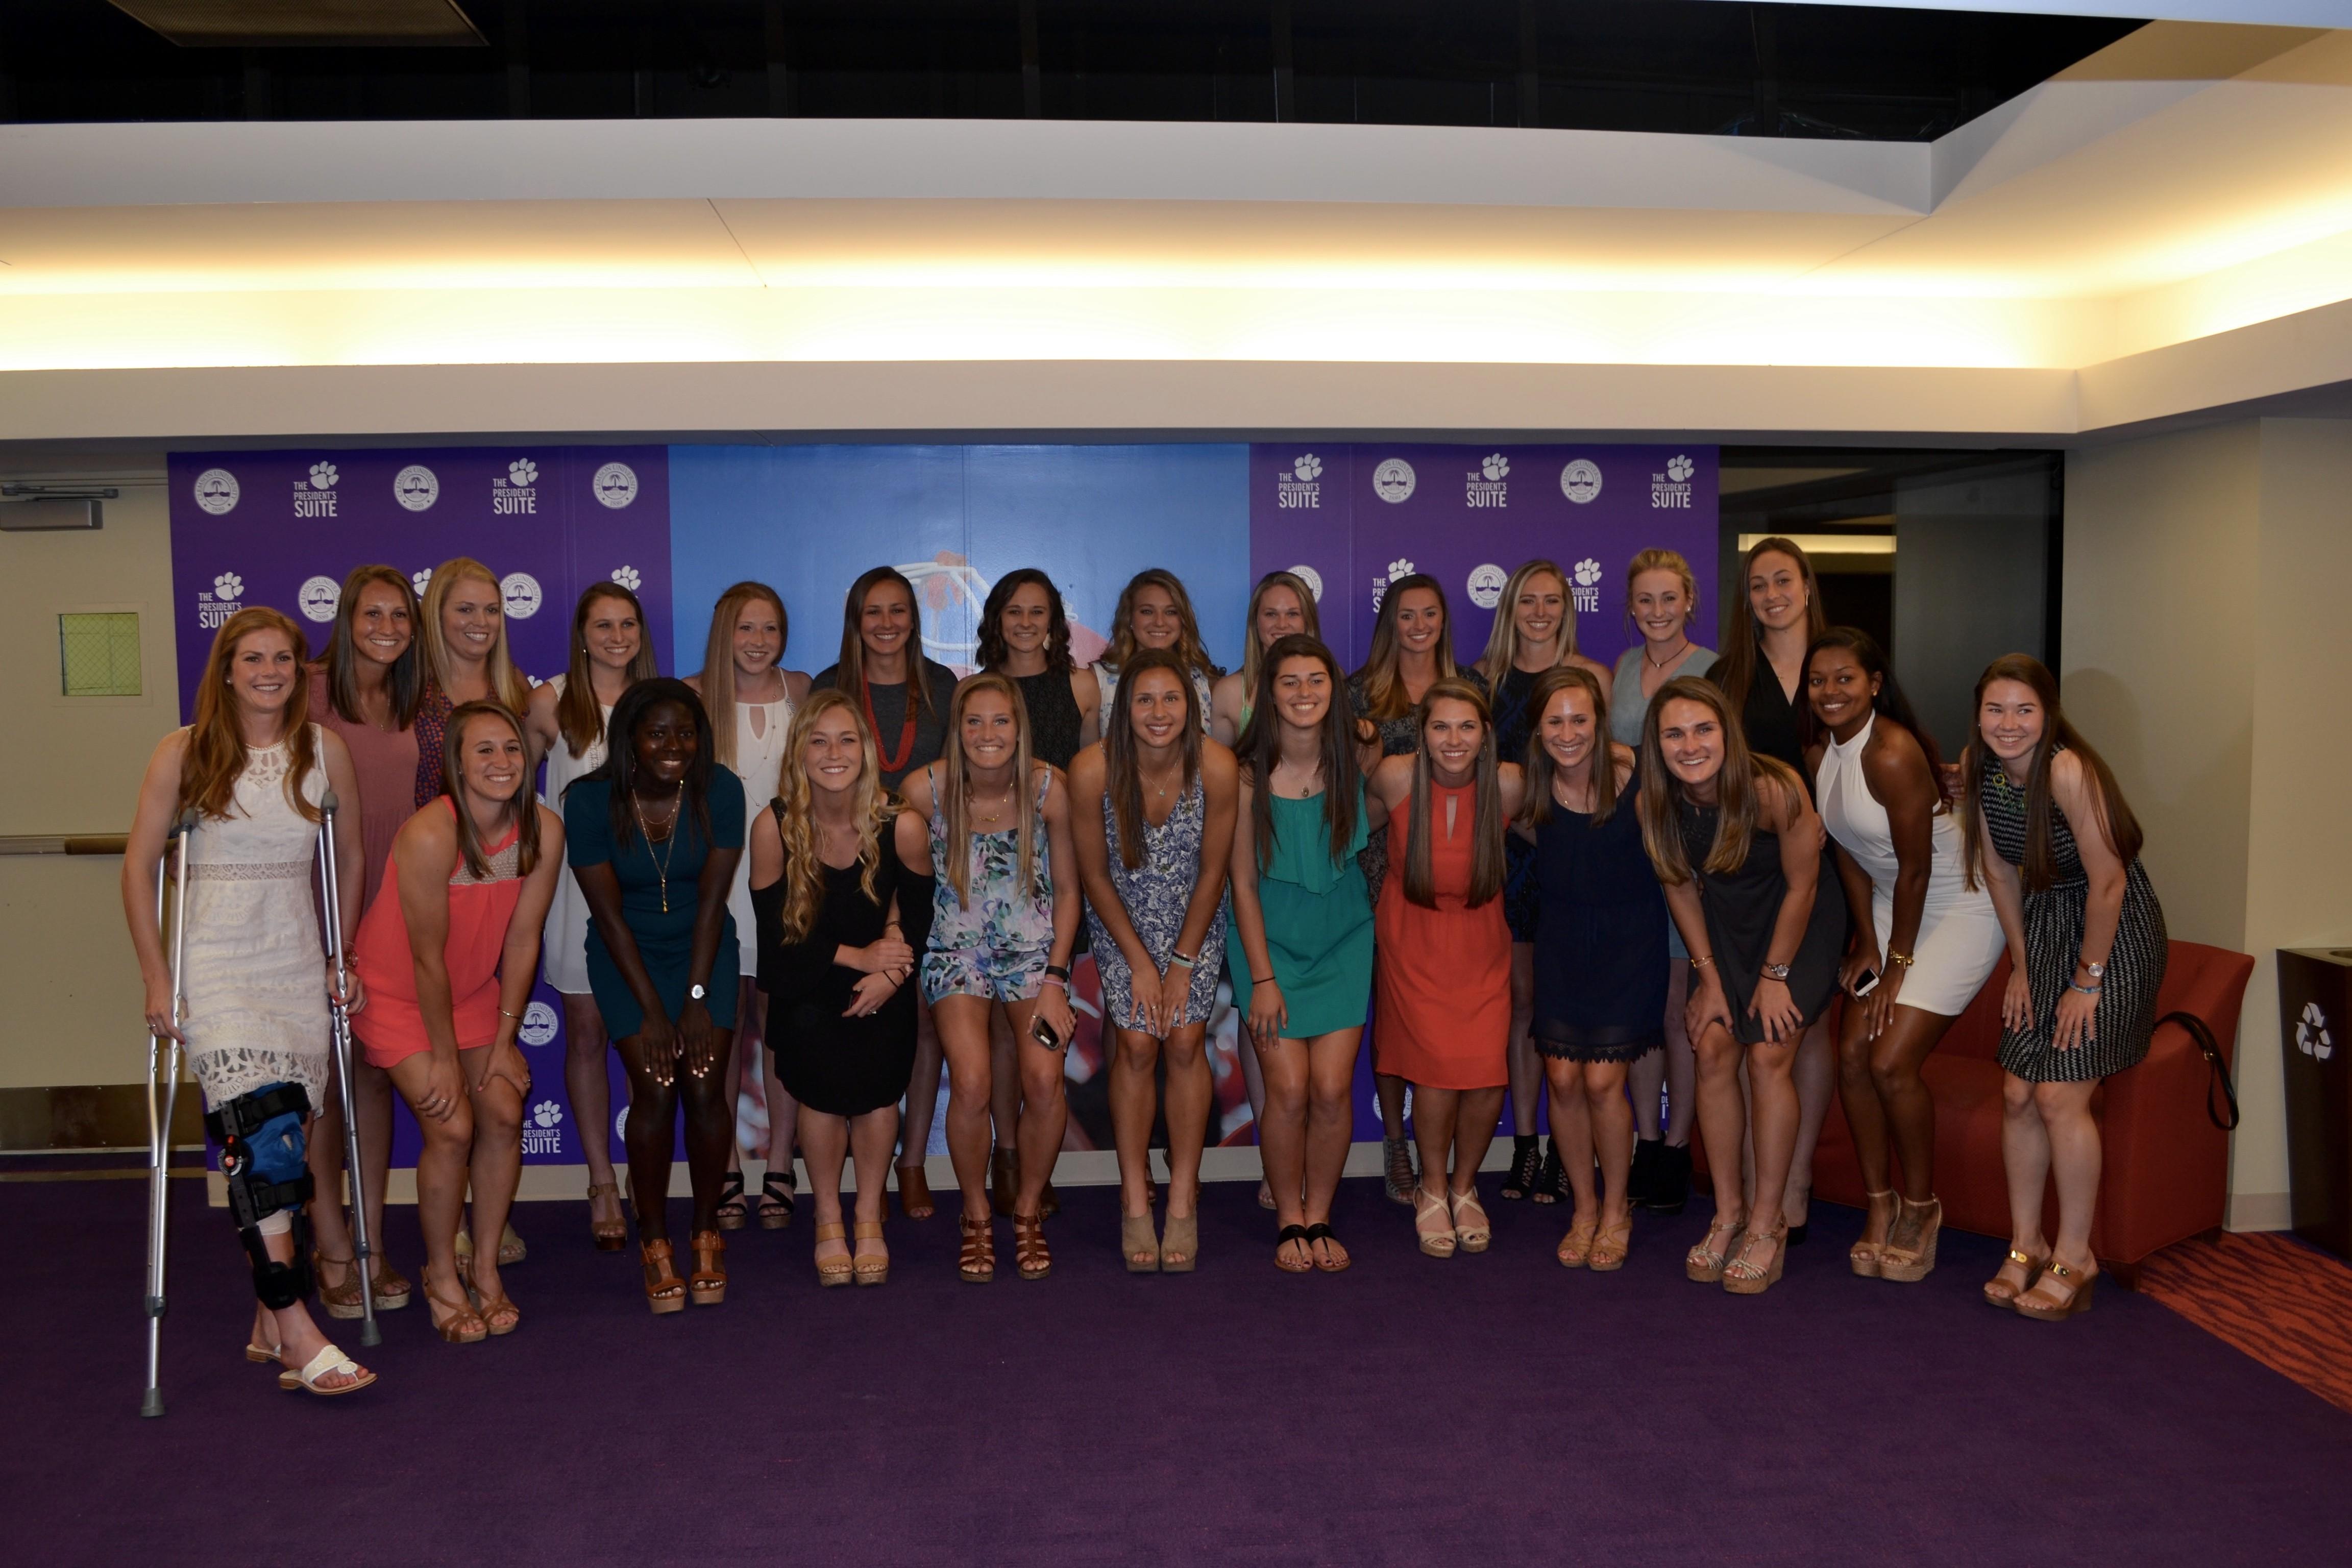 Clemson Women?s Soccer Program Celebrates Successful Season